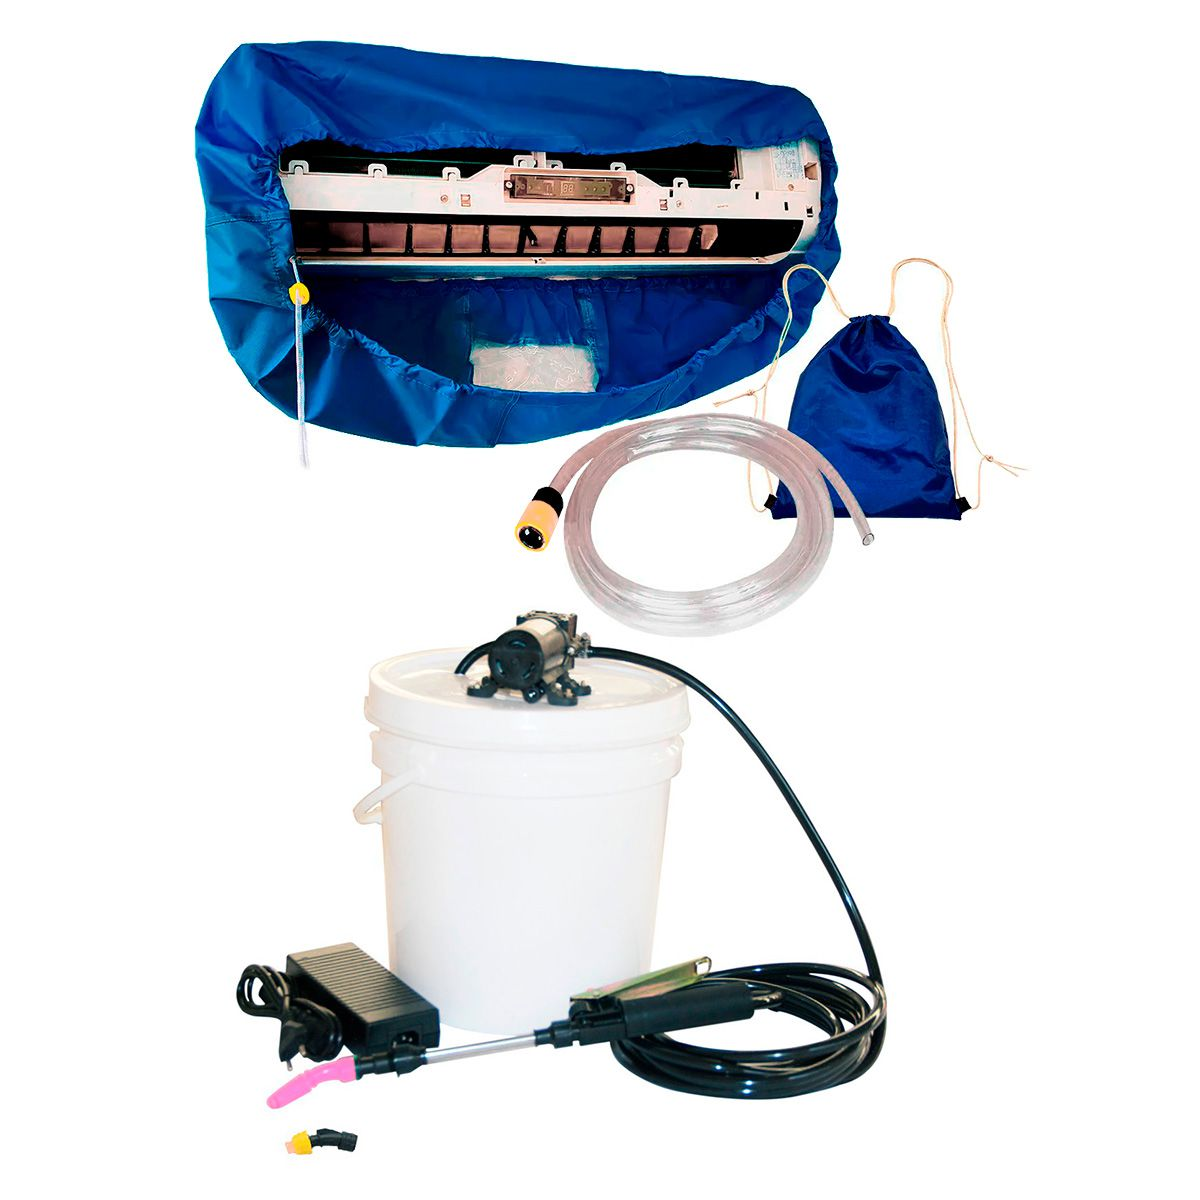 Lavadora Elétrica 12L 80PSI + Bolsa Coletora até 12000 BTUS